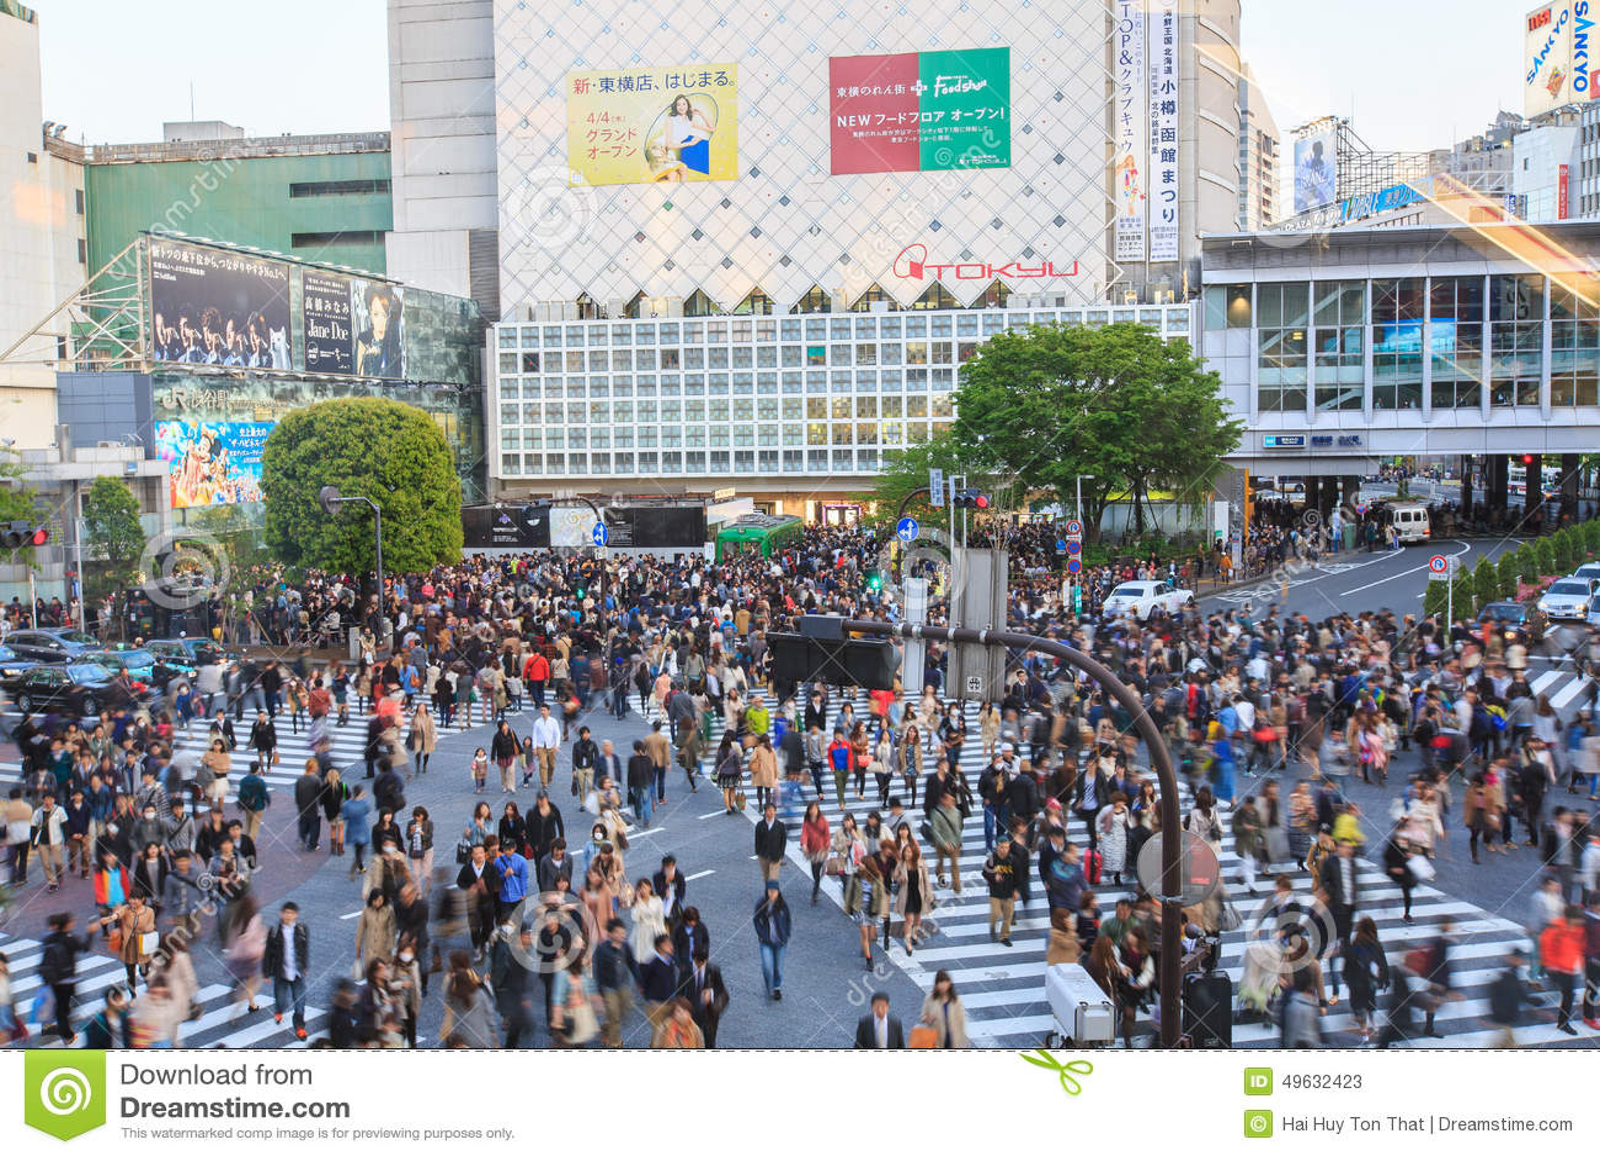 Crowd Crossing Street Editorial Stock Photo - Image: 49632423